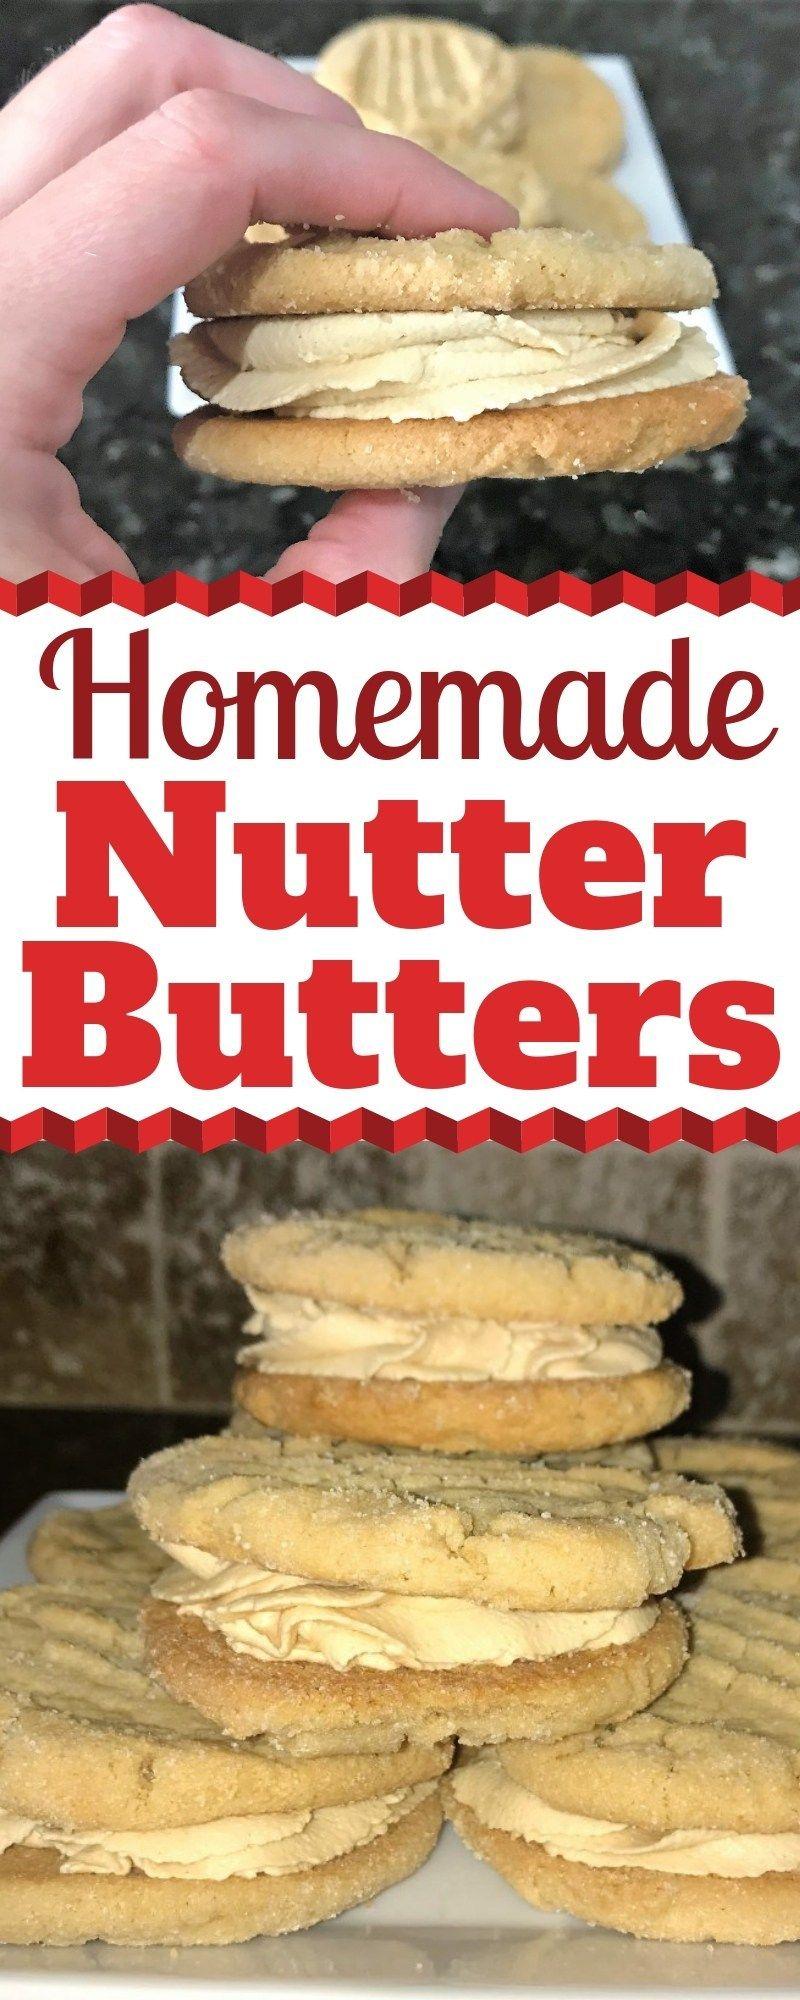 The Best Peanut Butter Sandwich Cookies - Homemade Nutter Butter   Grace Like Rain Blog #peanutbuttersquares